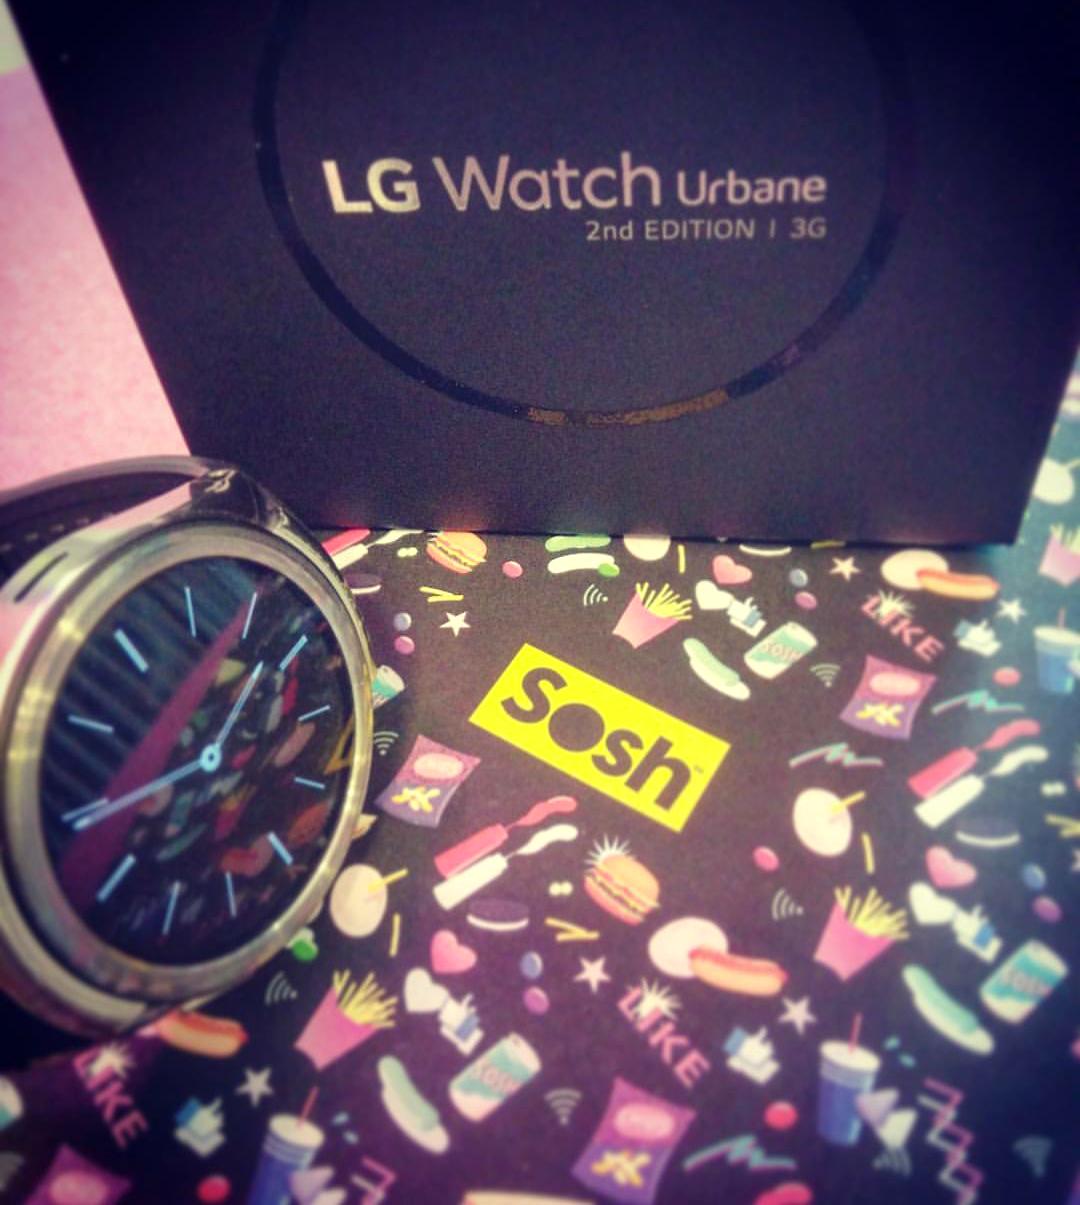 lg_watch_sosh.png